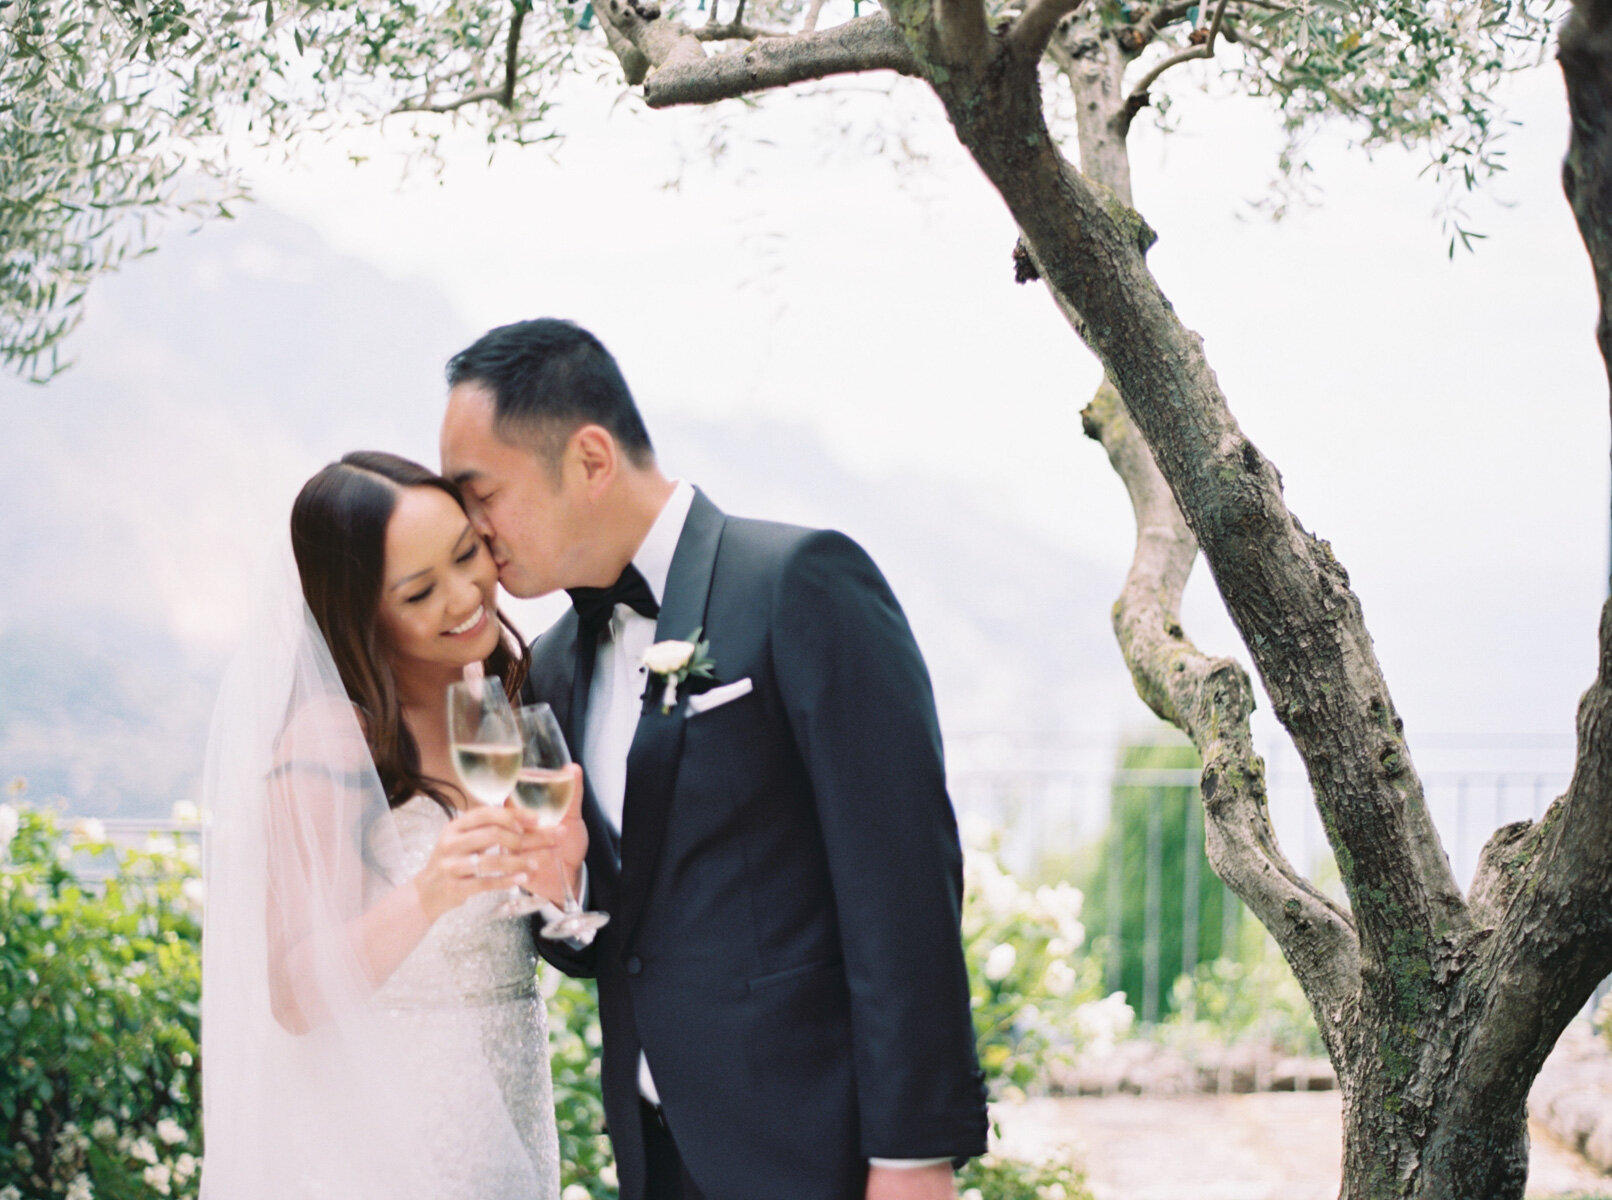 Belmond-Hotel-Caruso-ravello-elopement-Katie-Grant-destination-wedding (34 of 50).jpg